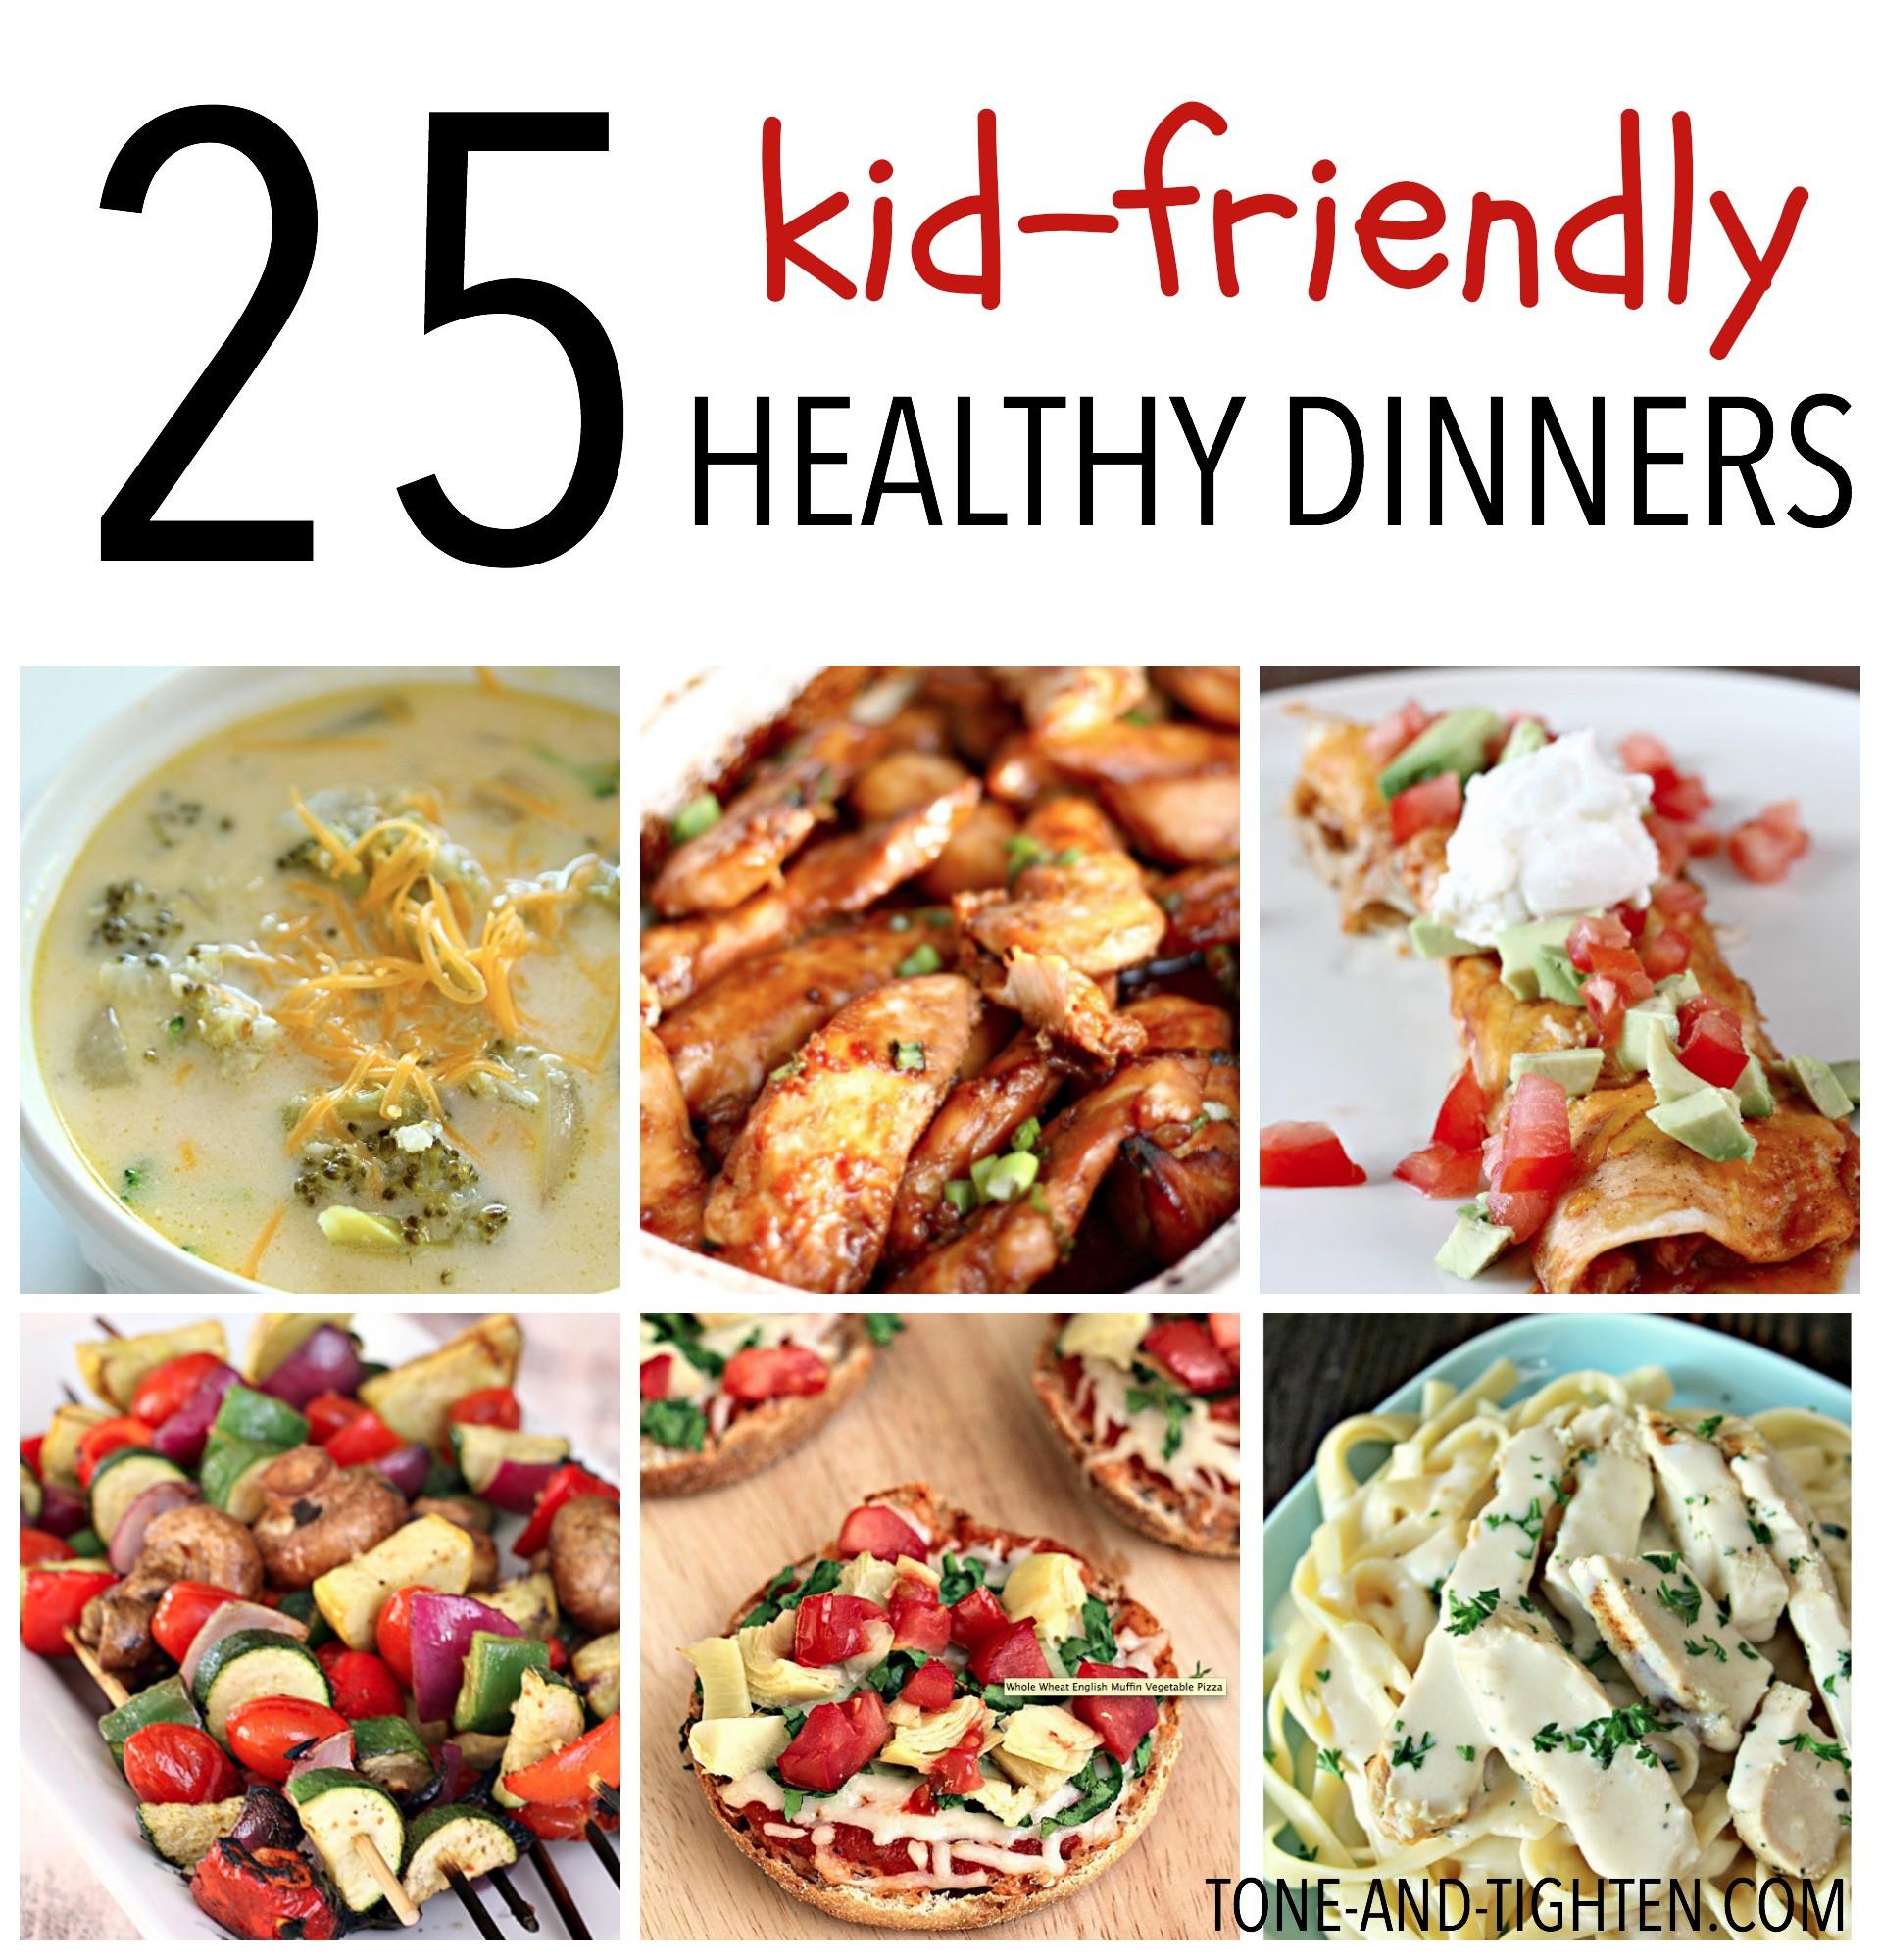 Easy Healthy Kid Friendly Dinners  25 Kid Friendly Healthy Dinners